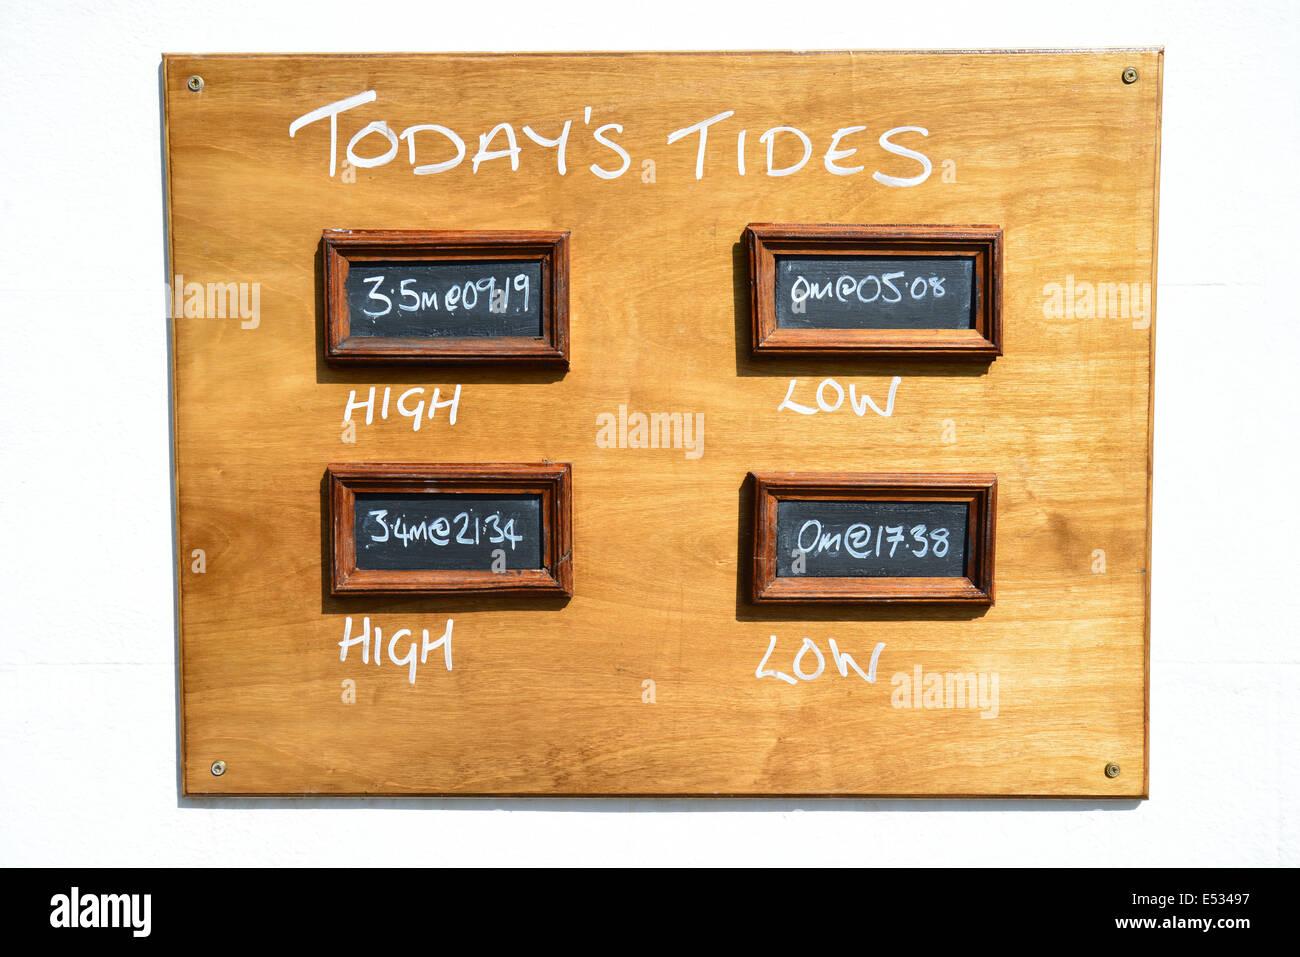 Tide board, The White Swan Pub, Riverside, Twickenham, Borough of Richmond upon Thames, Greater London, England, - Stock Image